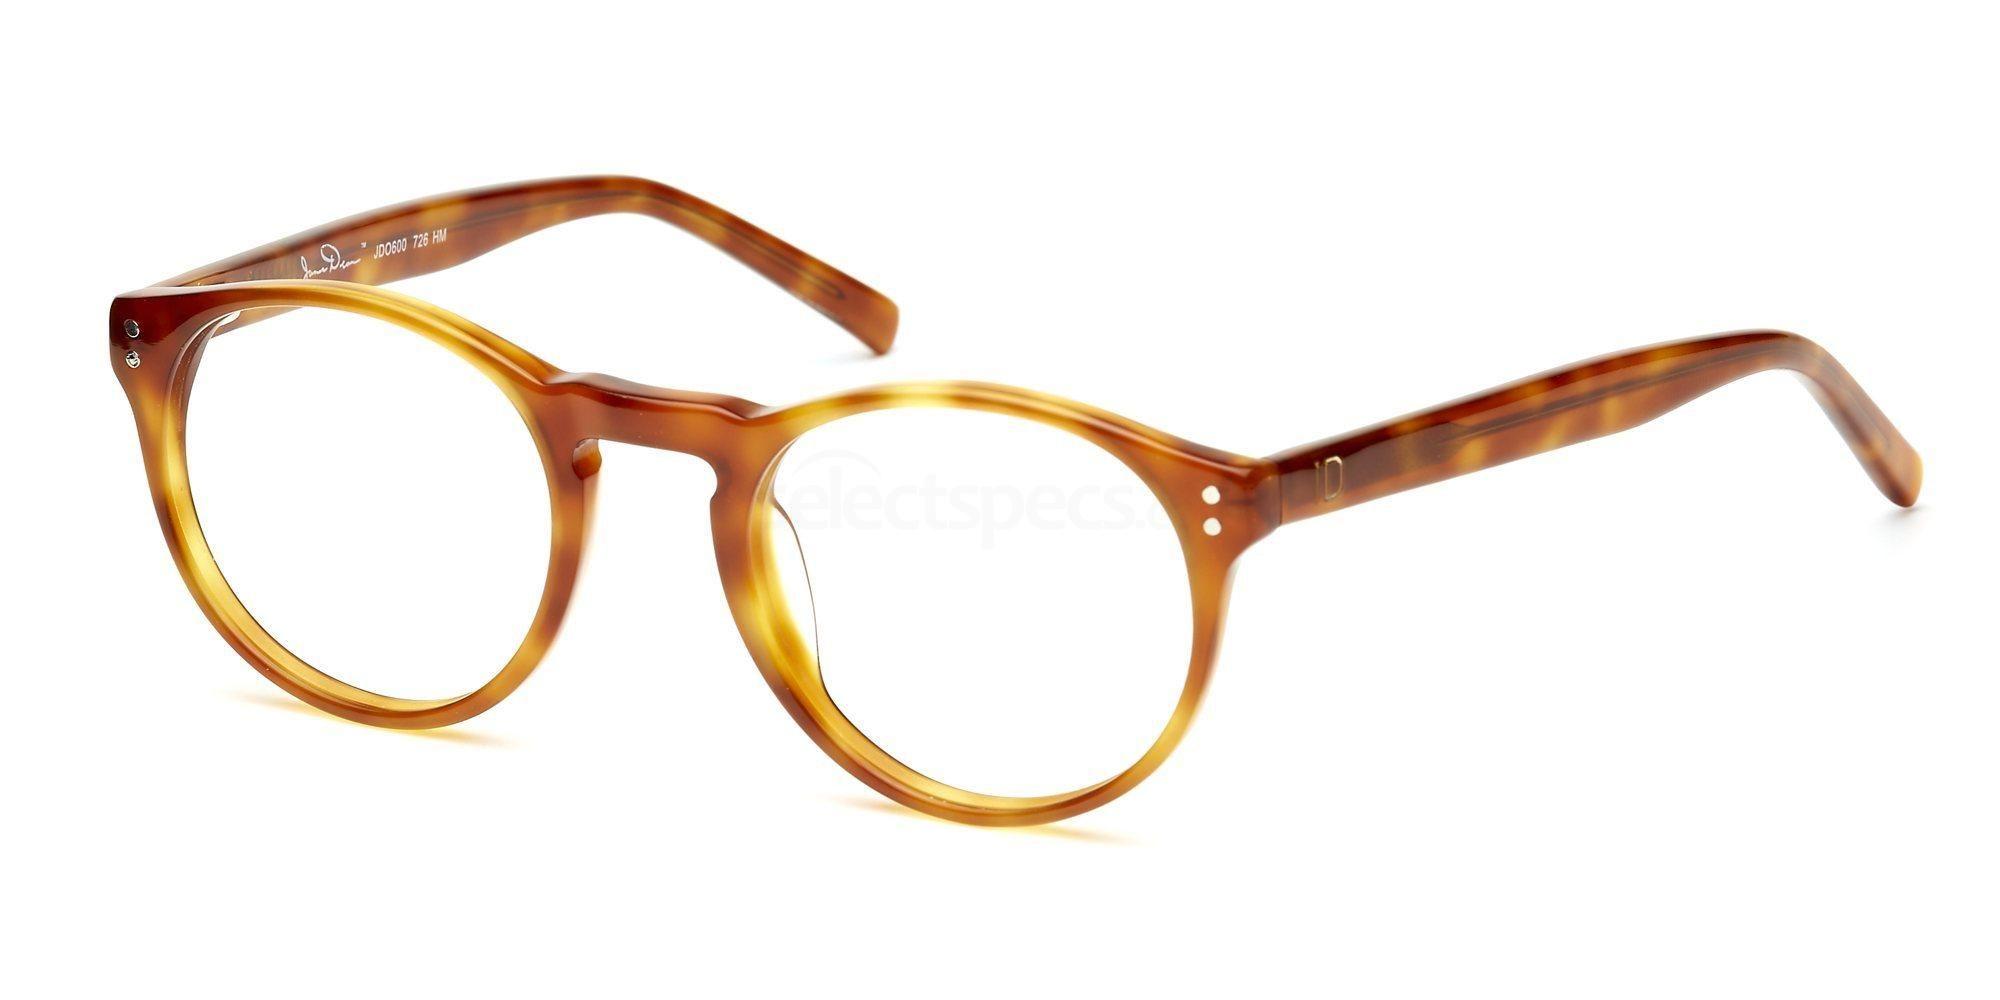 621b2ed679 James Dean Eyewear  Get the look of the 1950s Legend